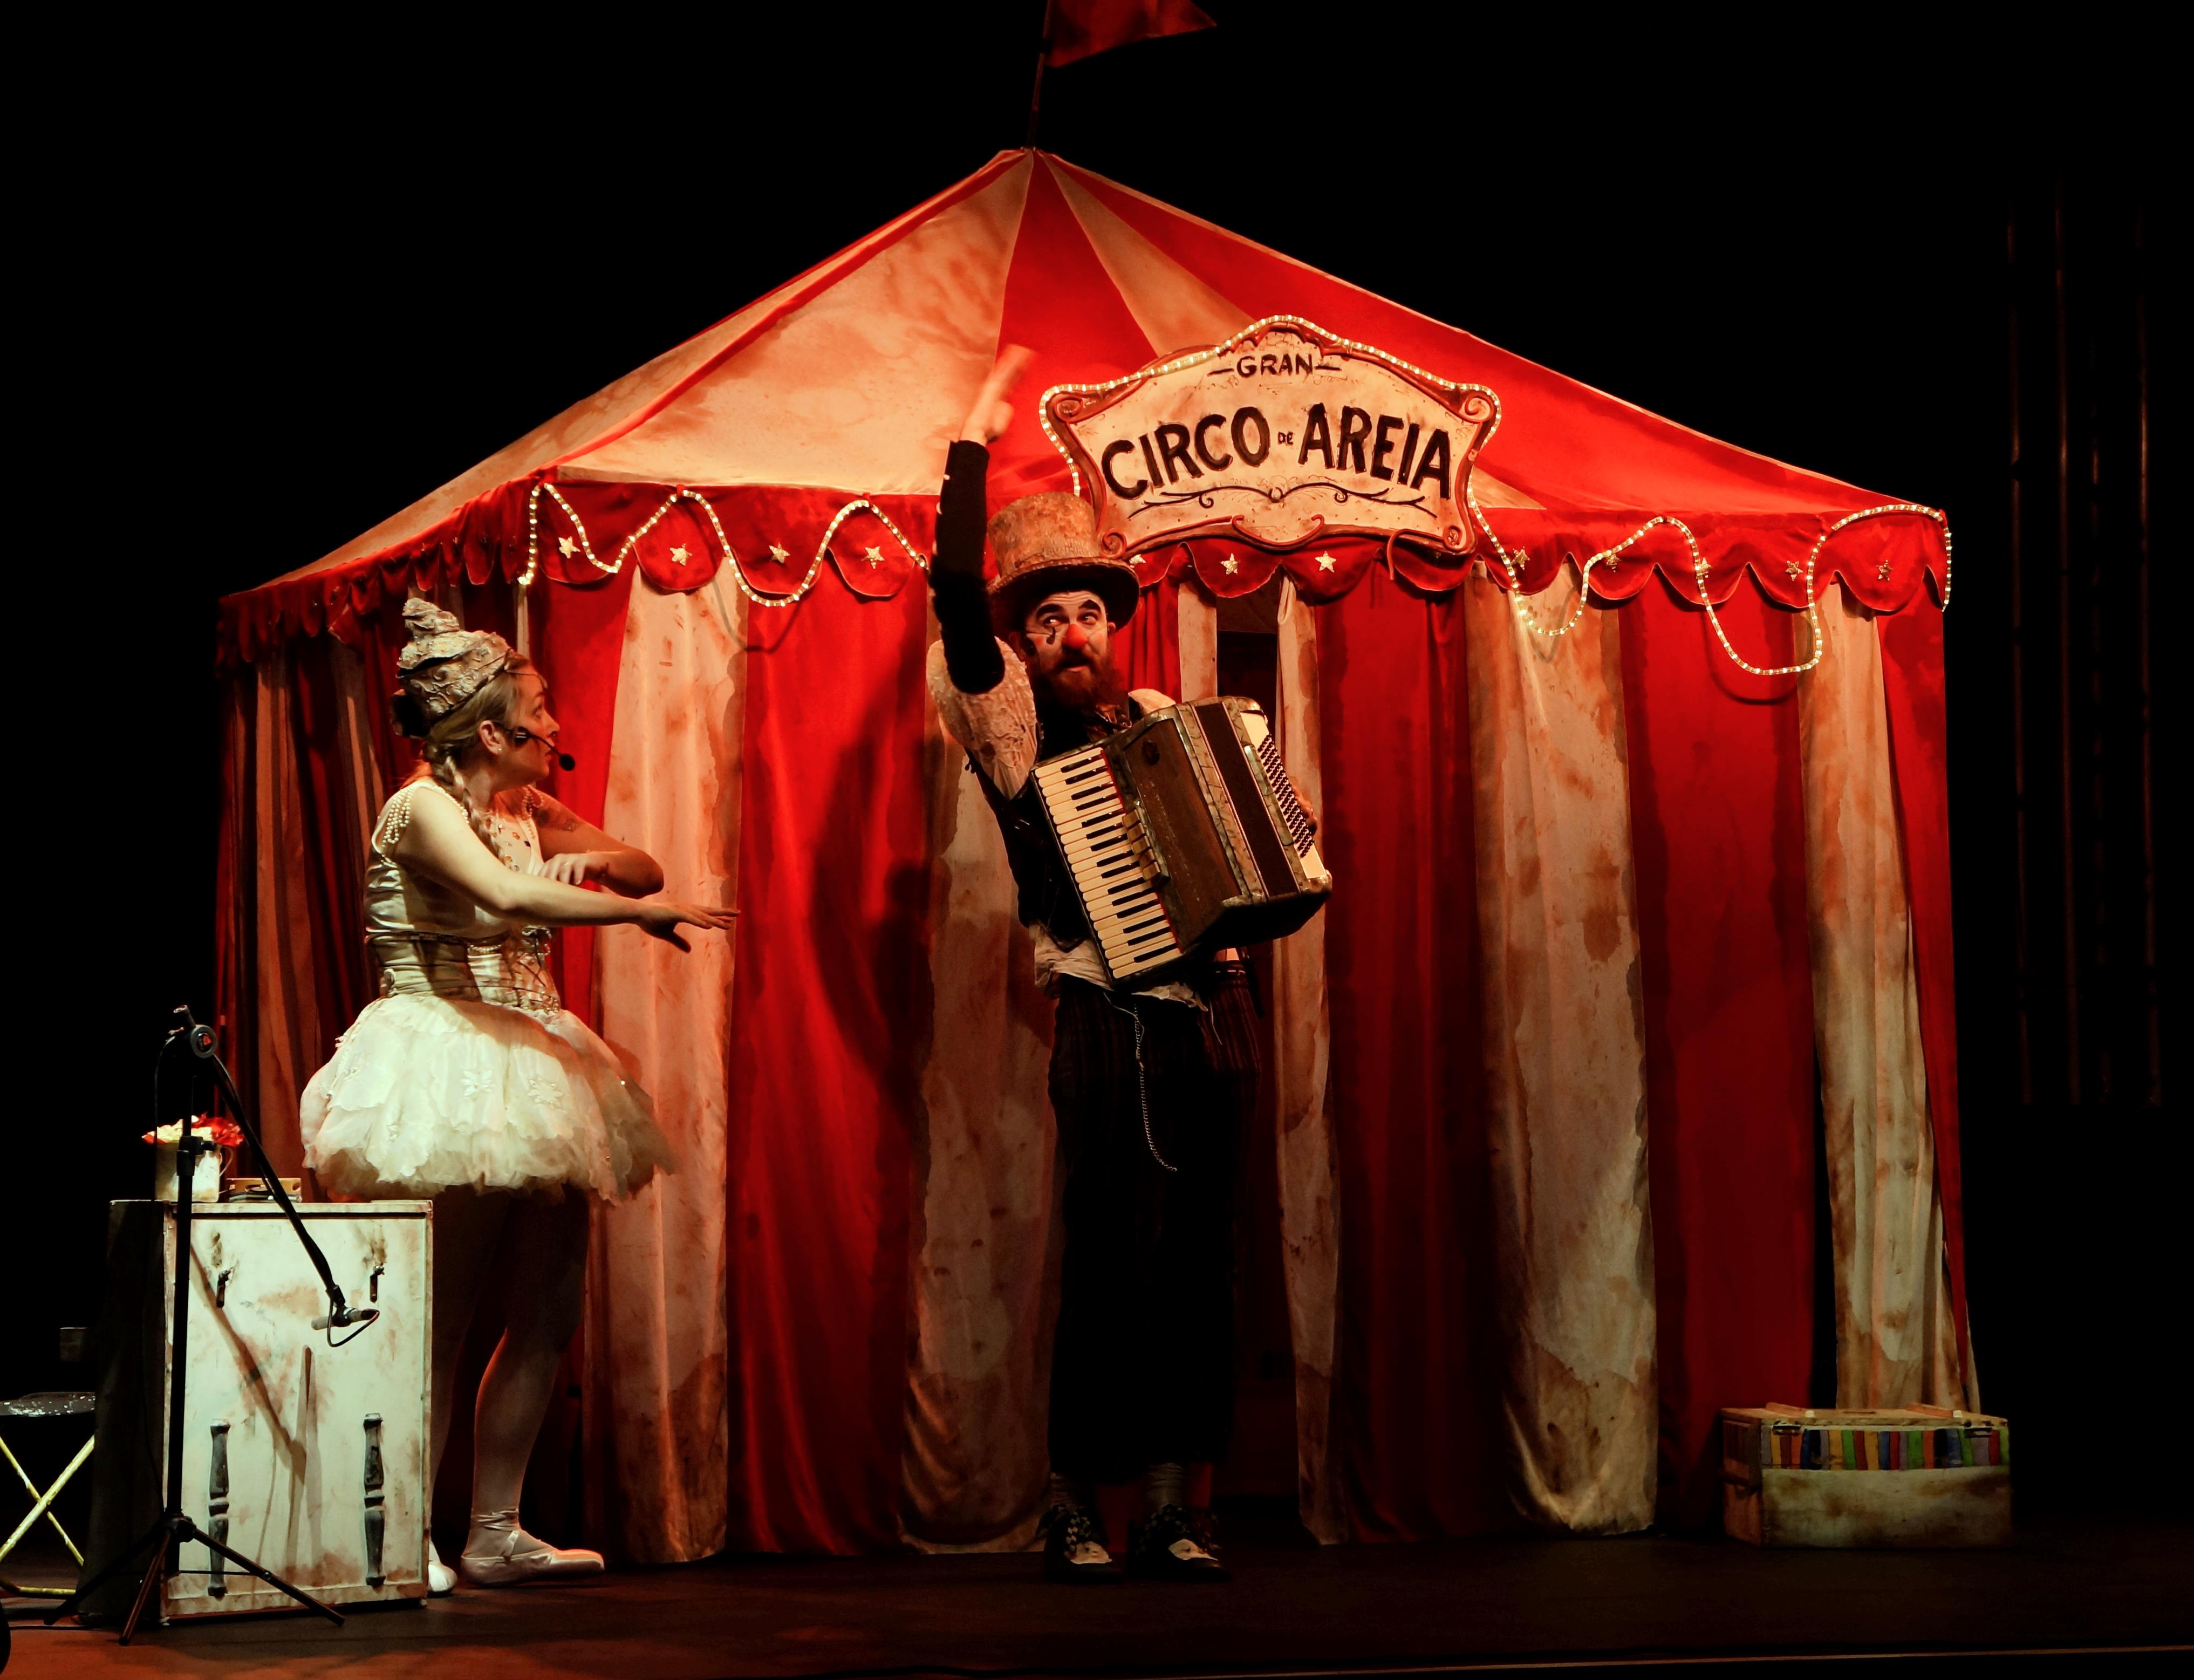 Gran Circo 01 - foto de Higaro Rosales